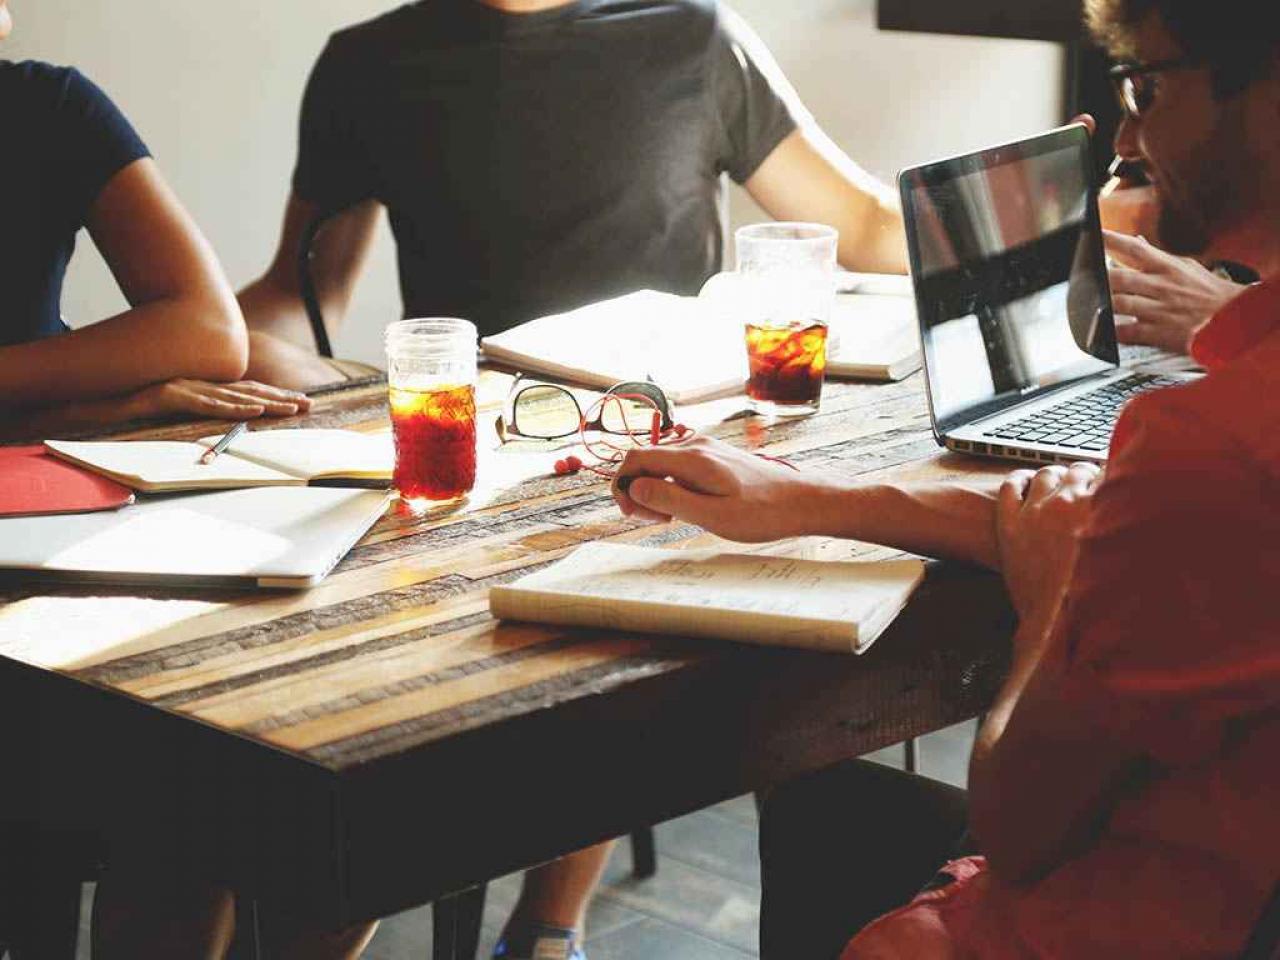 Imagen de Marketing Online para Emprendedores por Movidagrafica